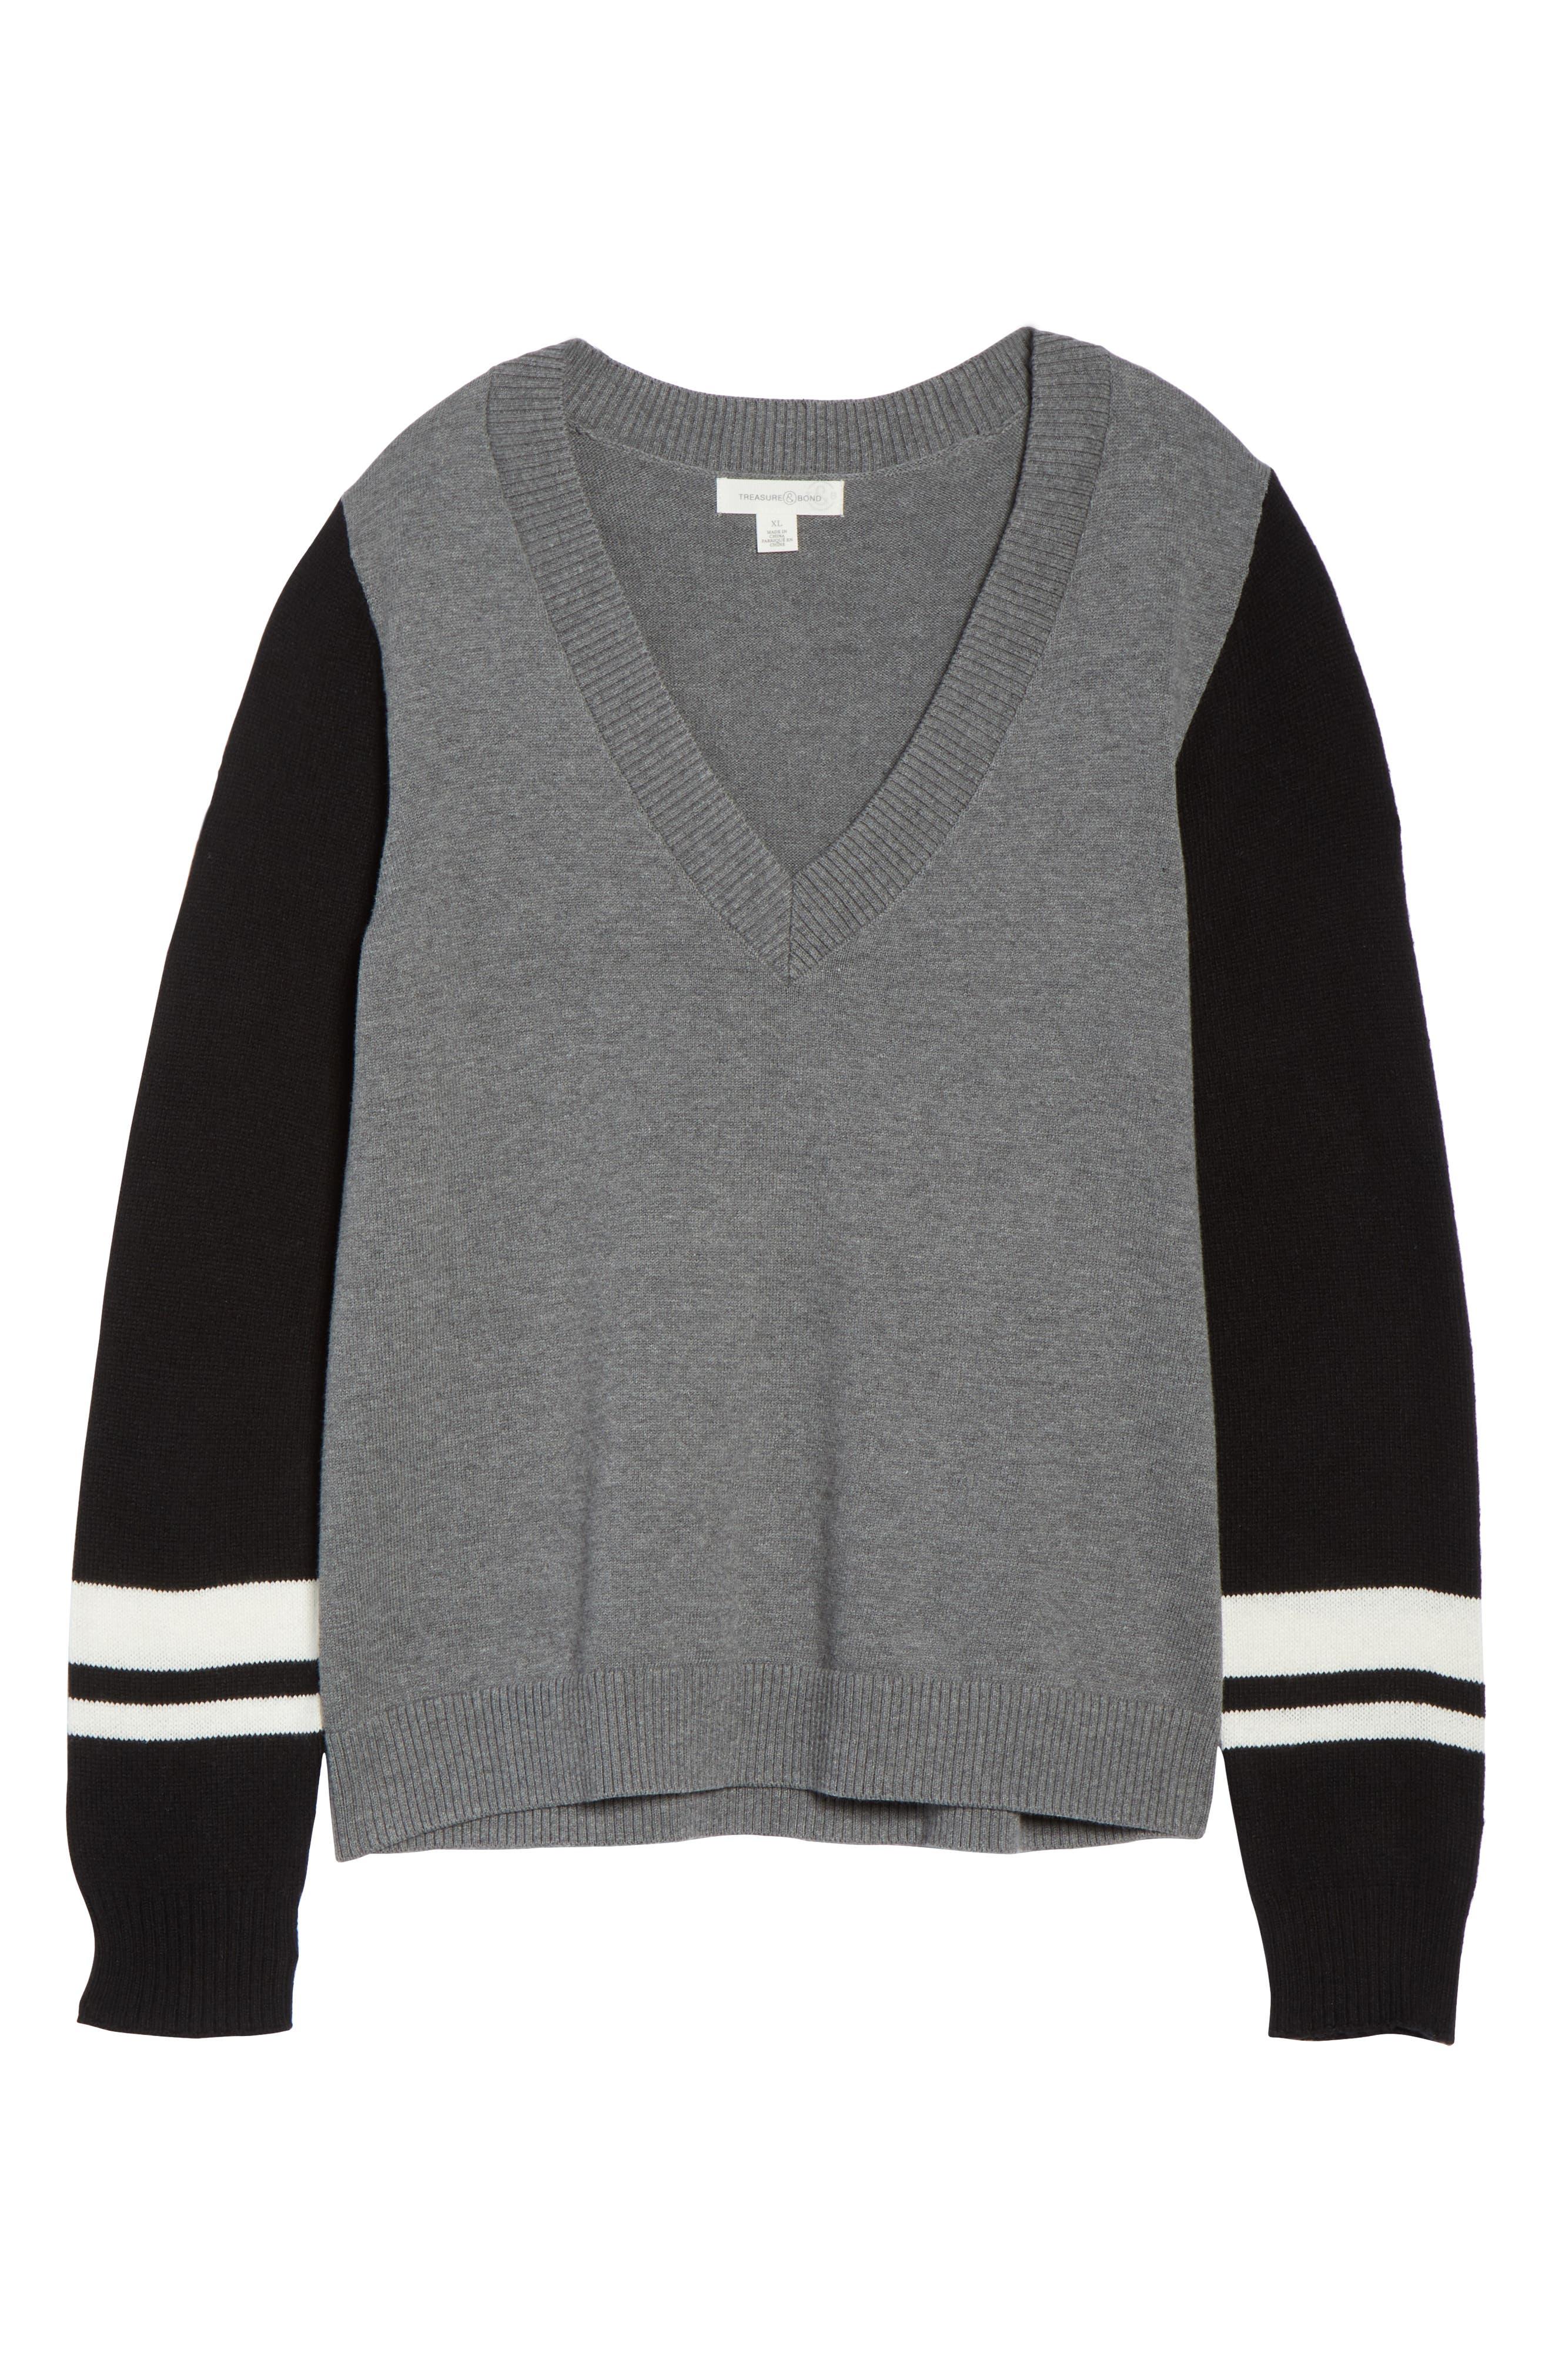 Stripe V-Neck Sweater,                             Alternate thumbnail 12, color,                             GREY HEATHER COMBO